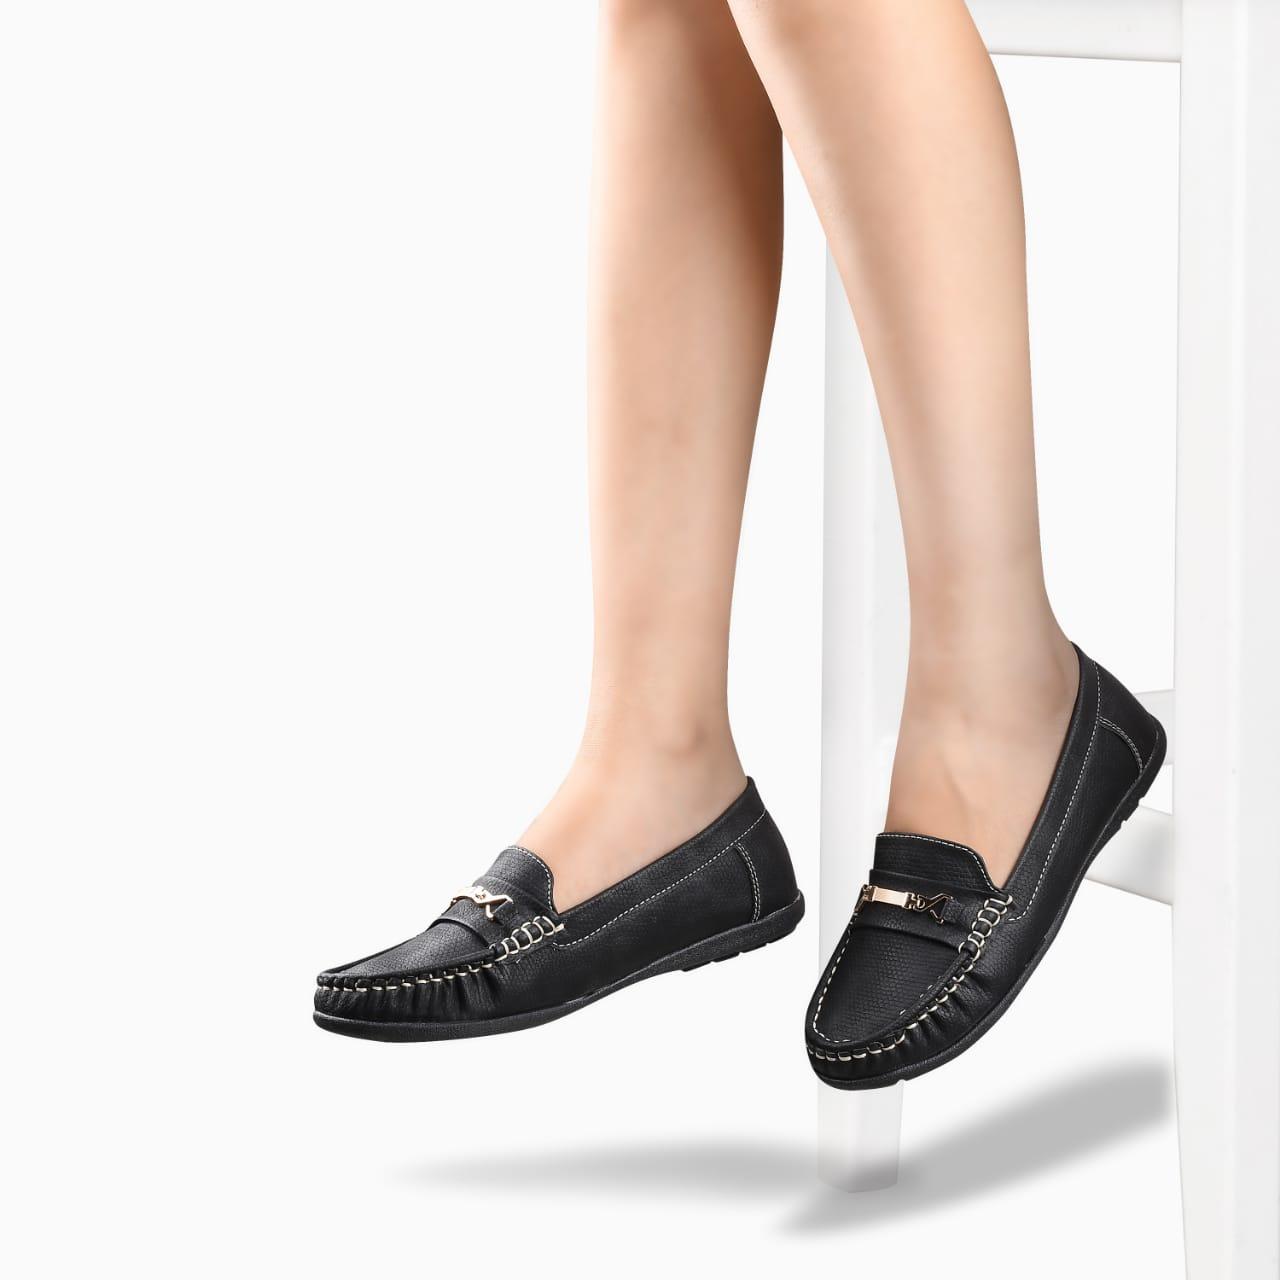 SALARIO   Salario Panelled Loafers with Applique